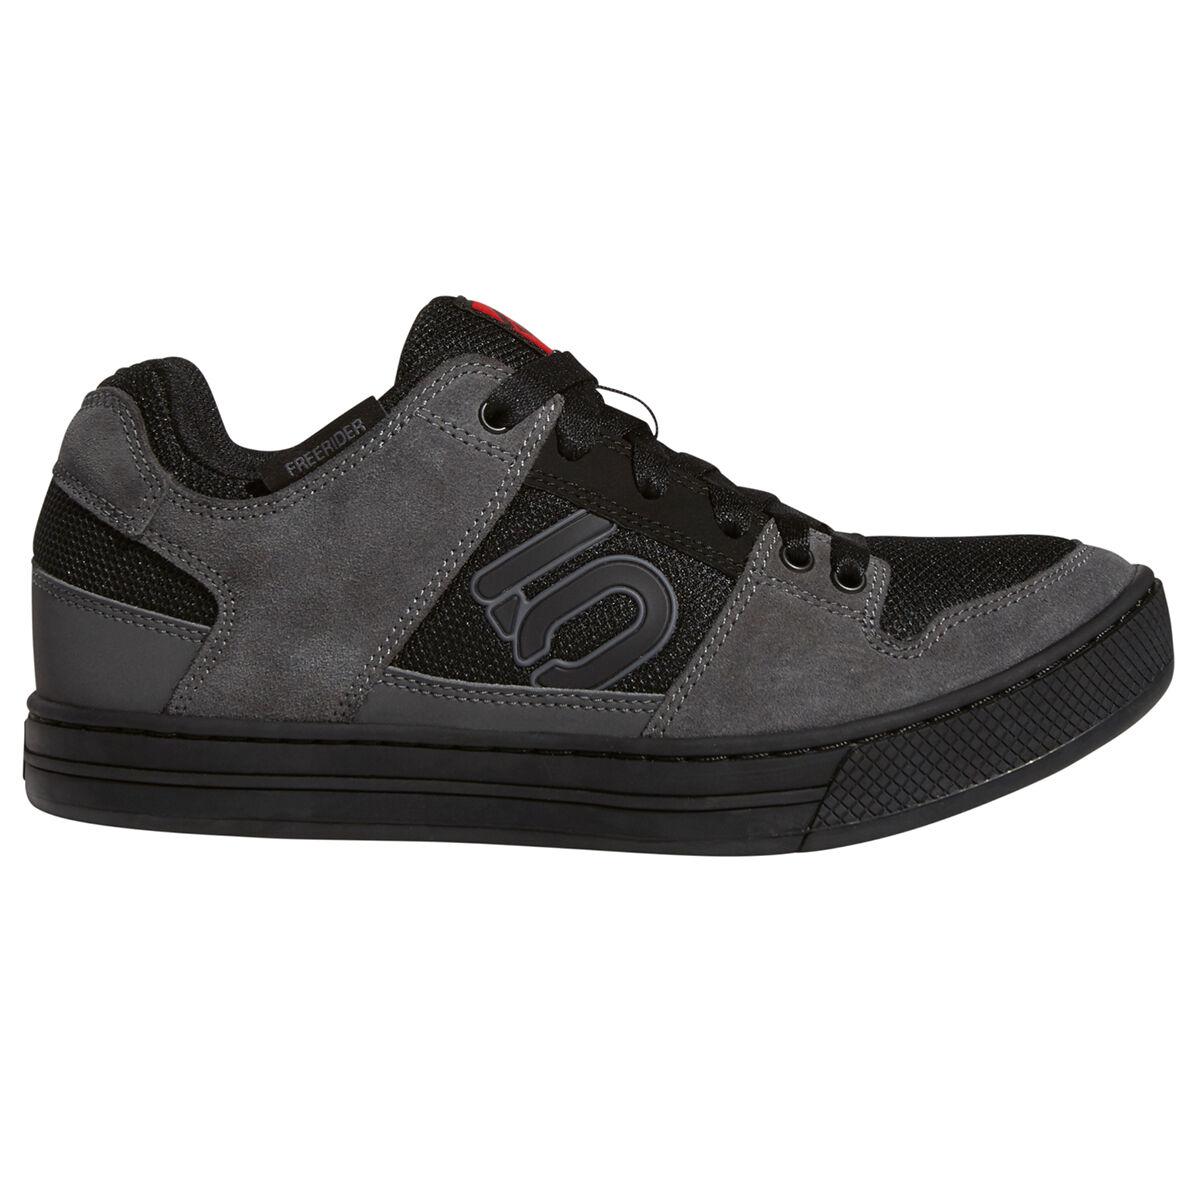 FIVE.TEN Five. ten Men's Freerider Mountain Bike Shoes - Size 10.5